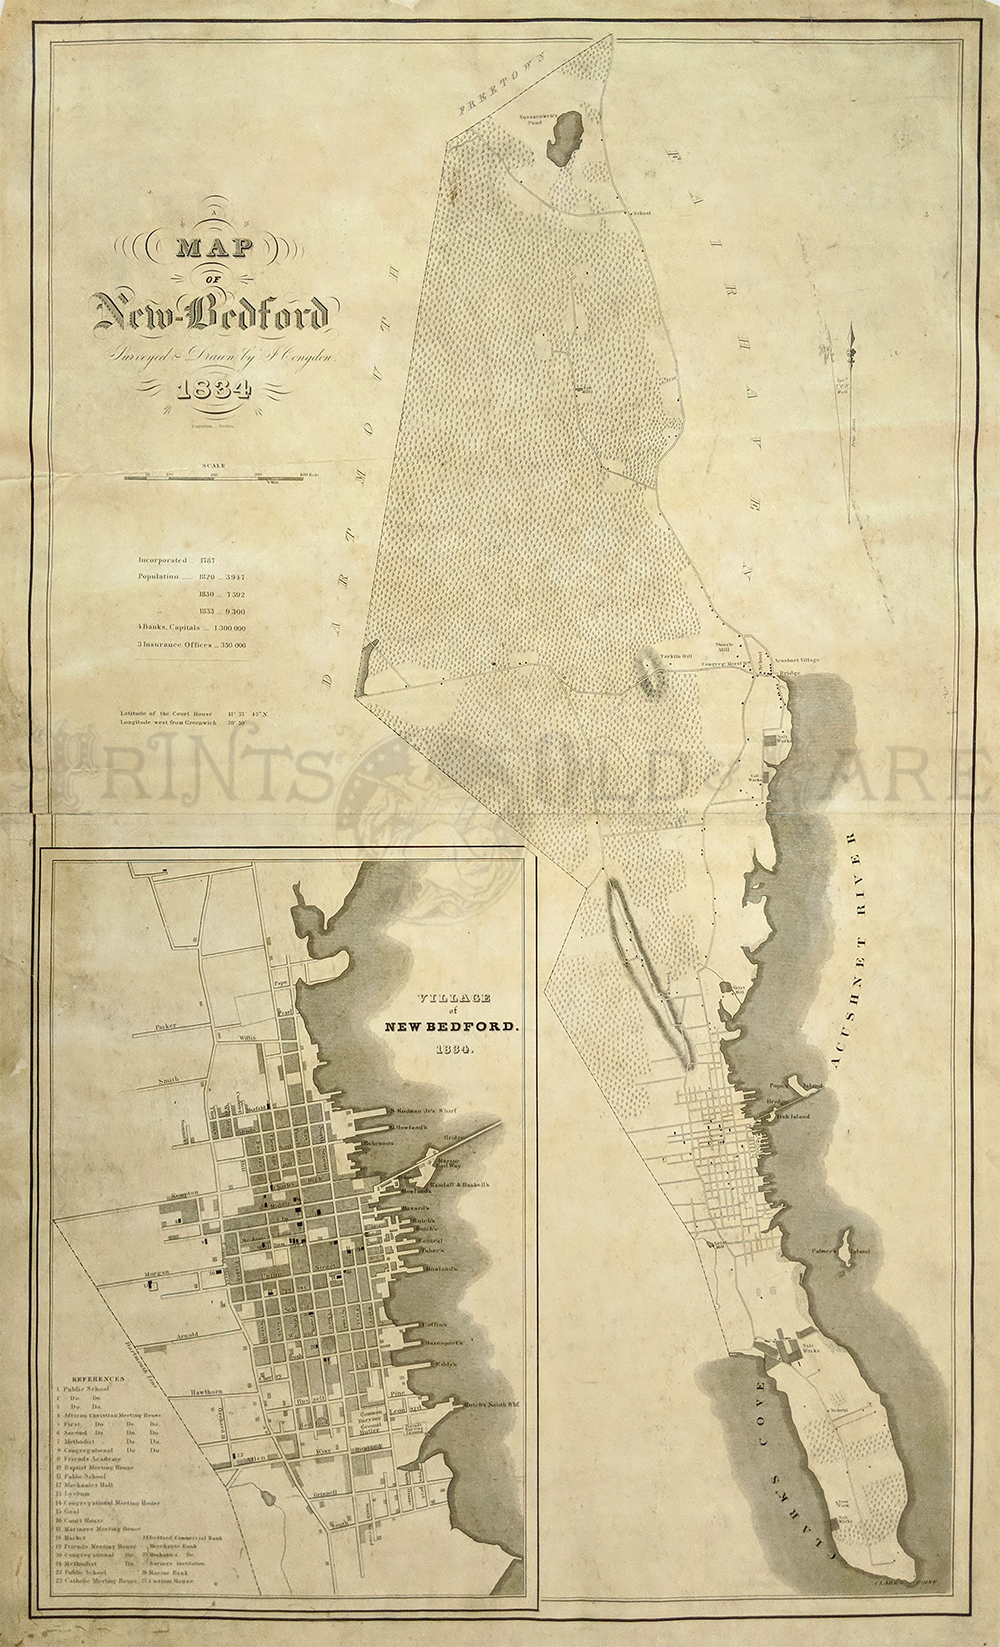 Antique Boston Map.Prints Old Rare Massachusetts Antique Maps Prints